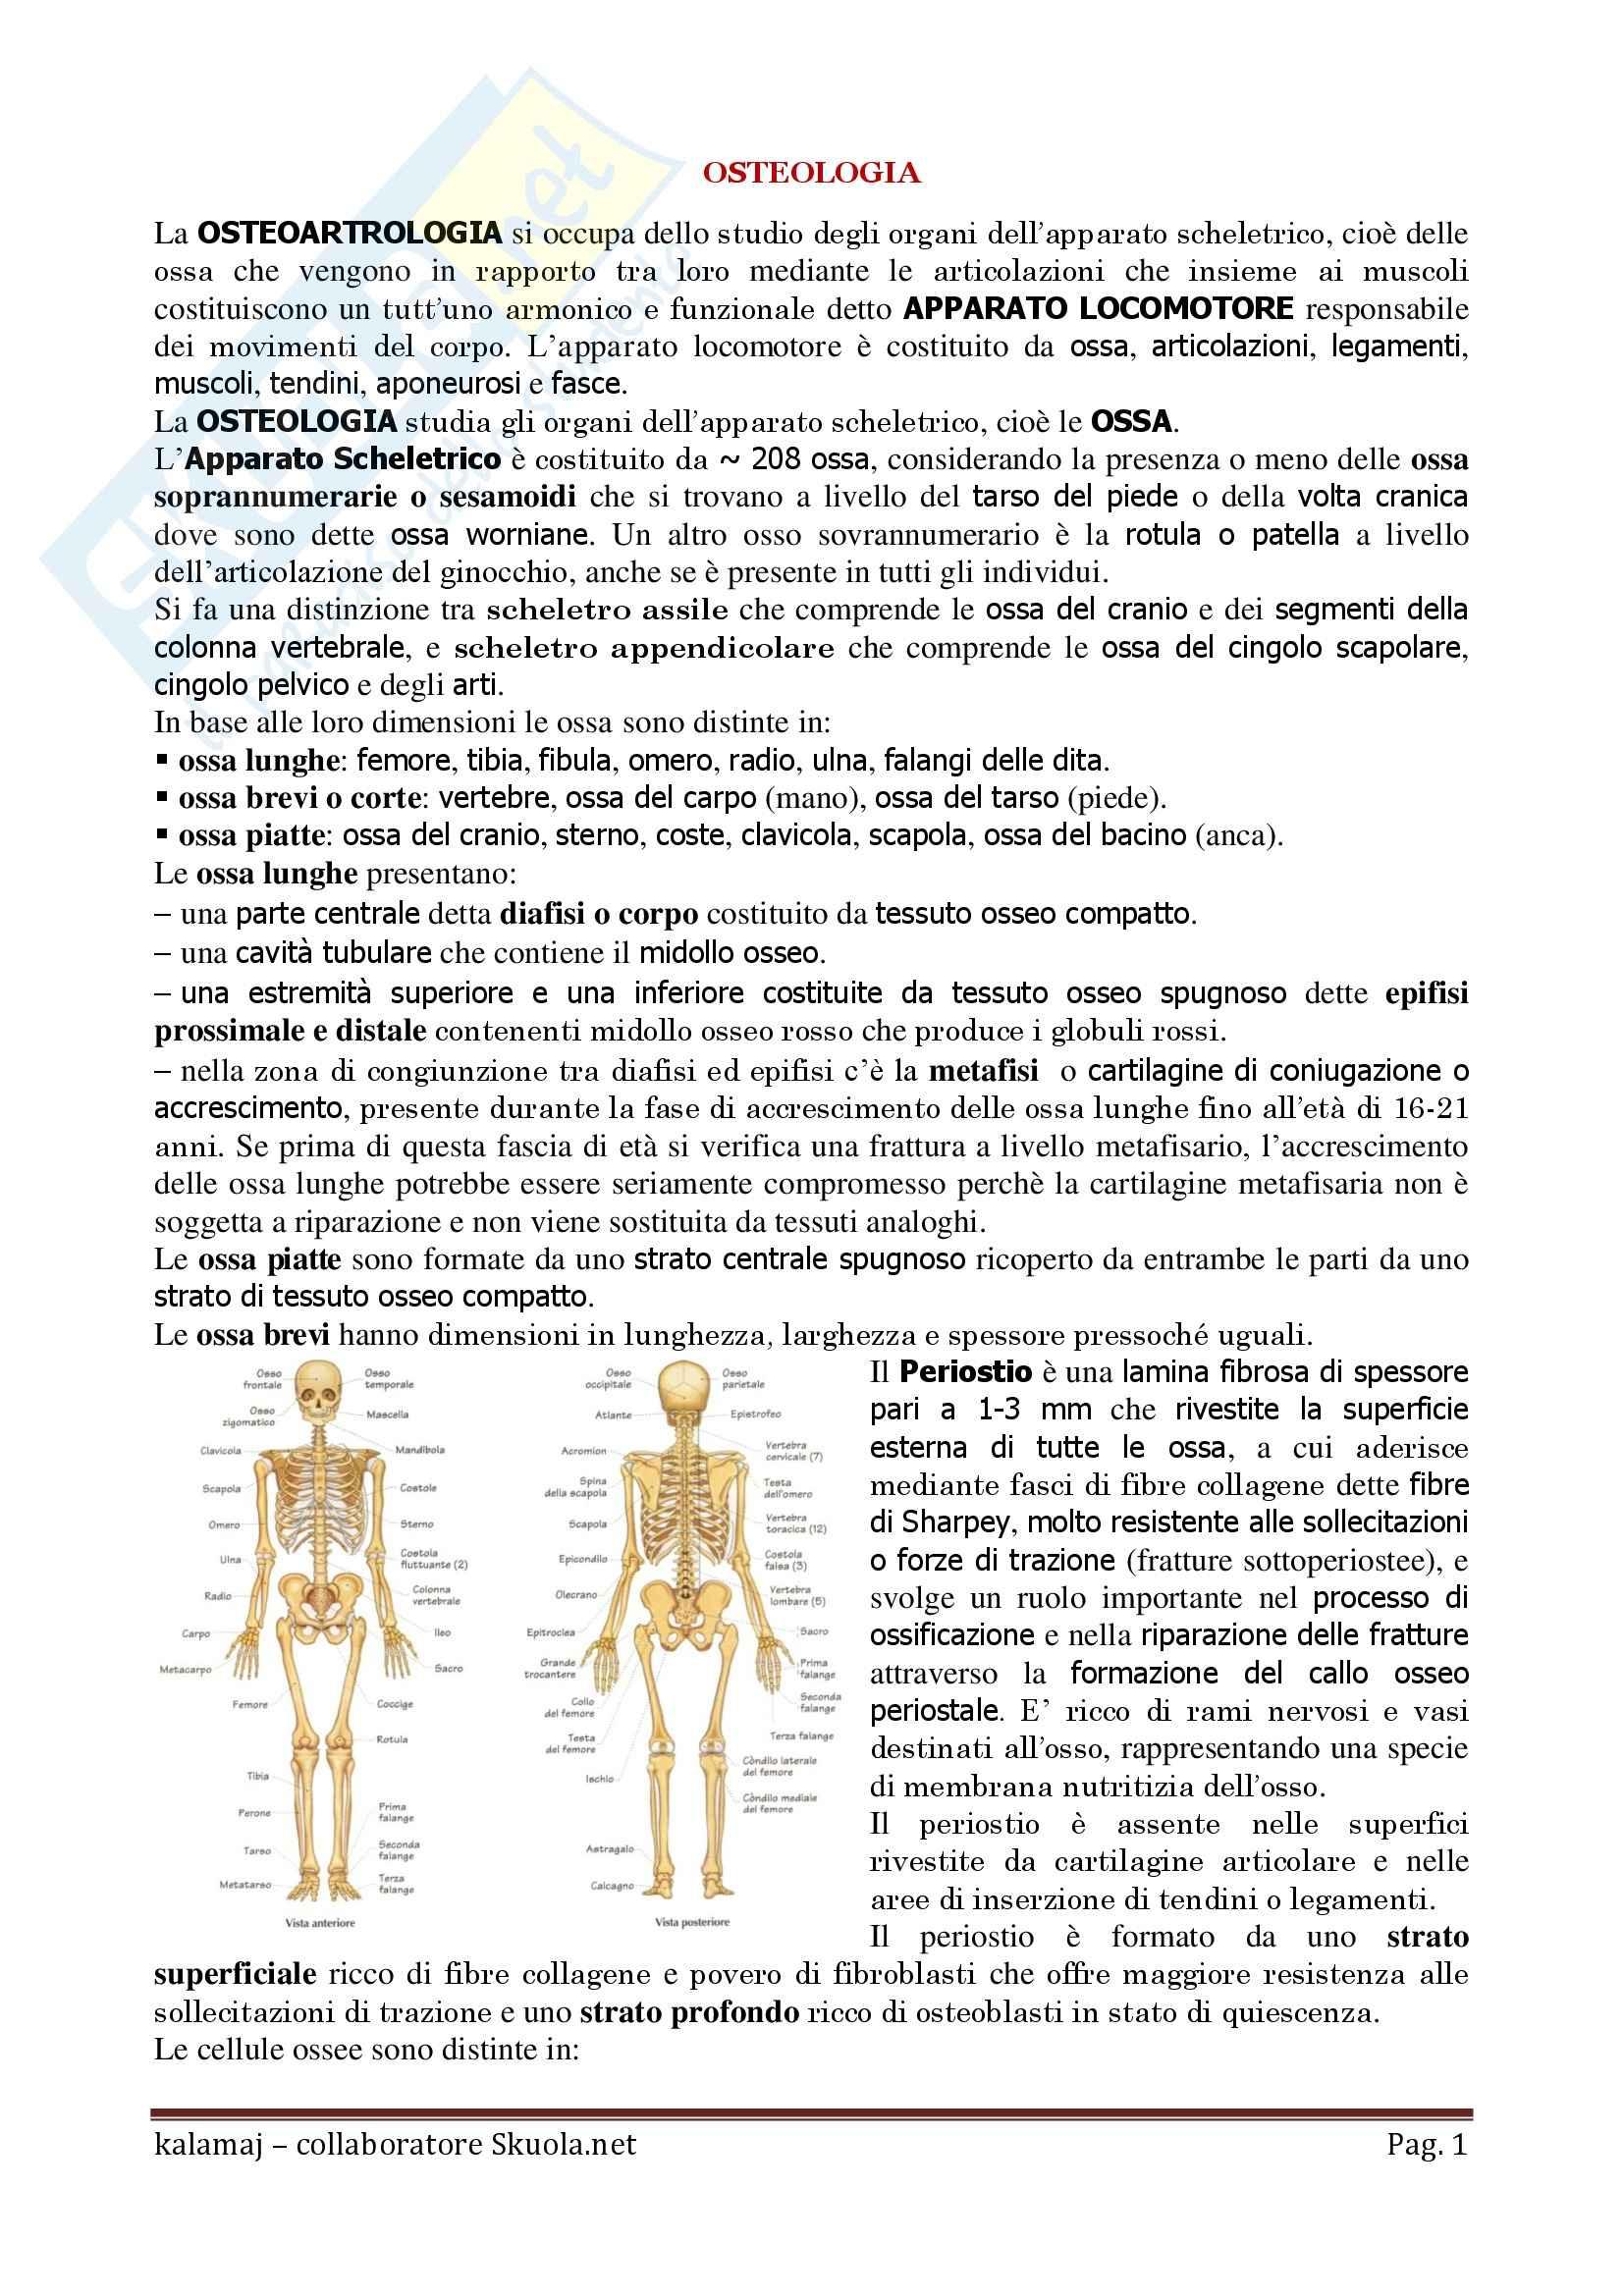 Anatomia umana - Osteologia